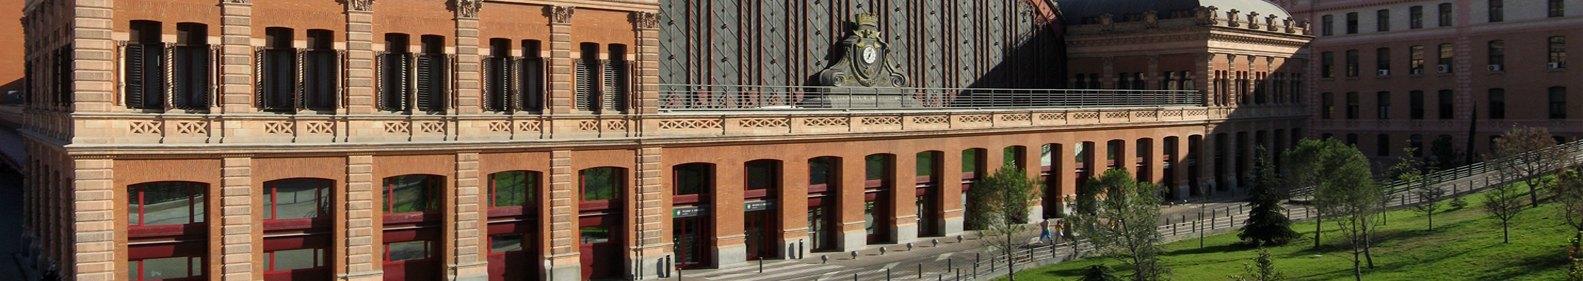 Aula-Atocha-para-alquilar